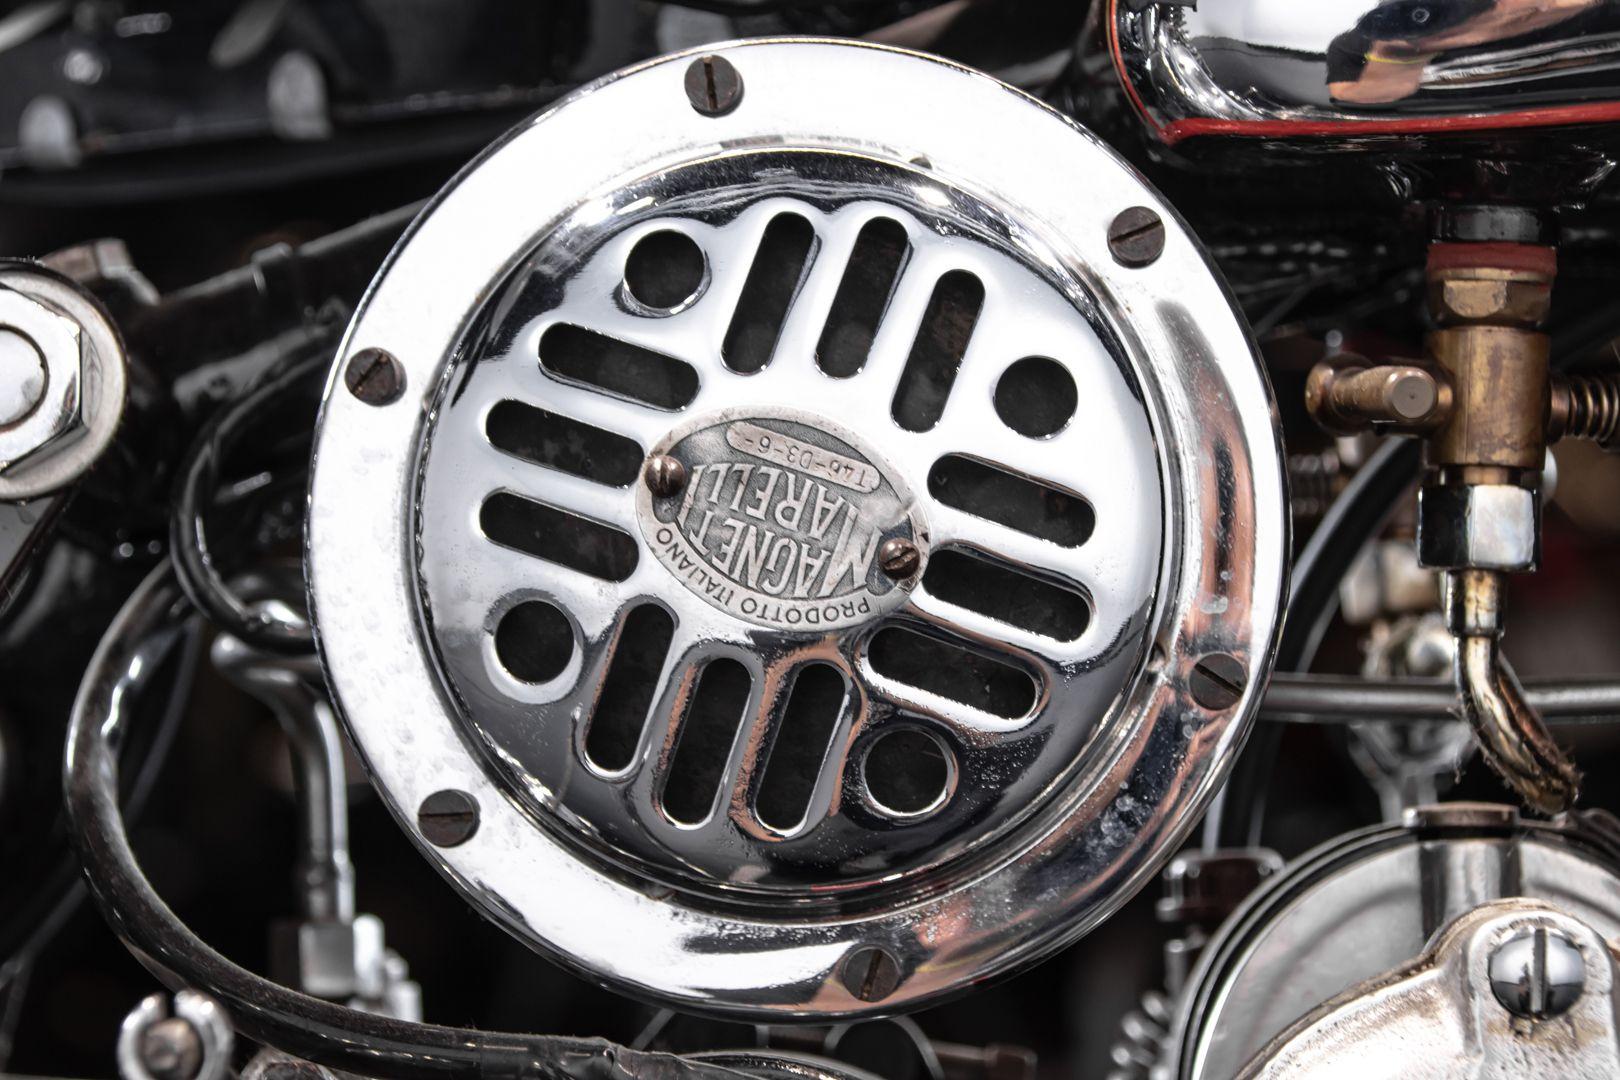 1951 Moto Guzzi 500 72200